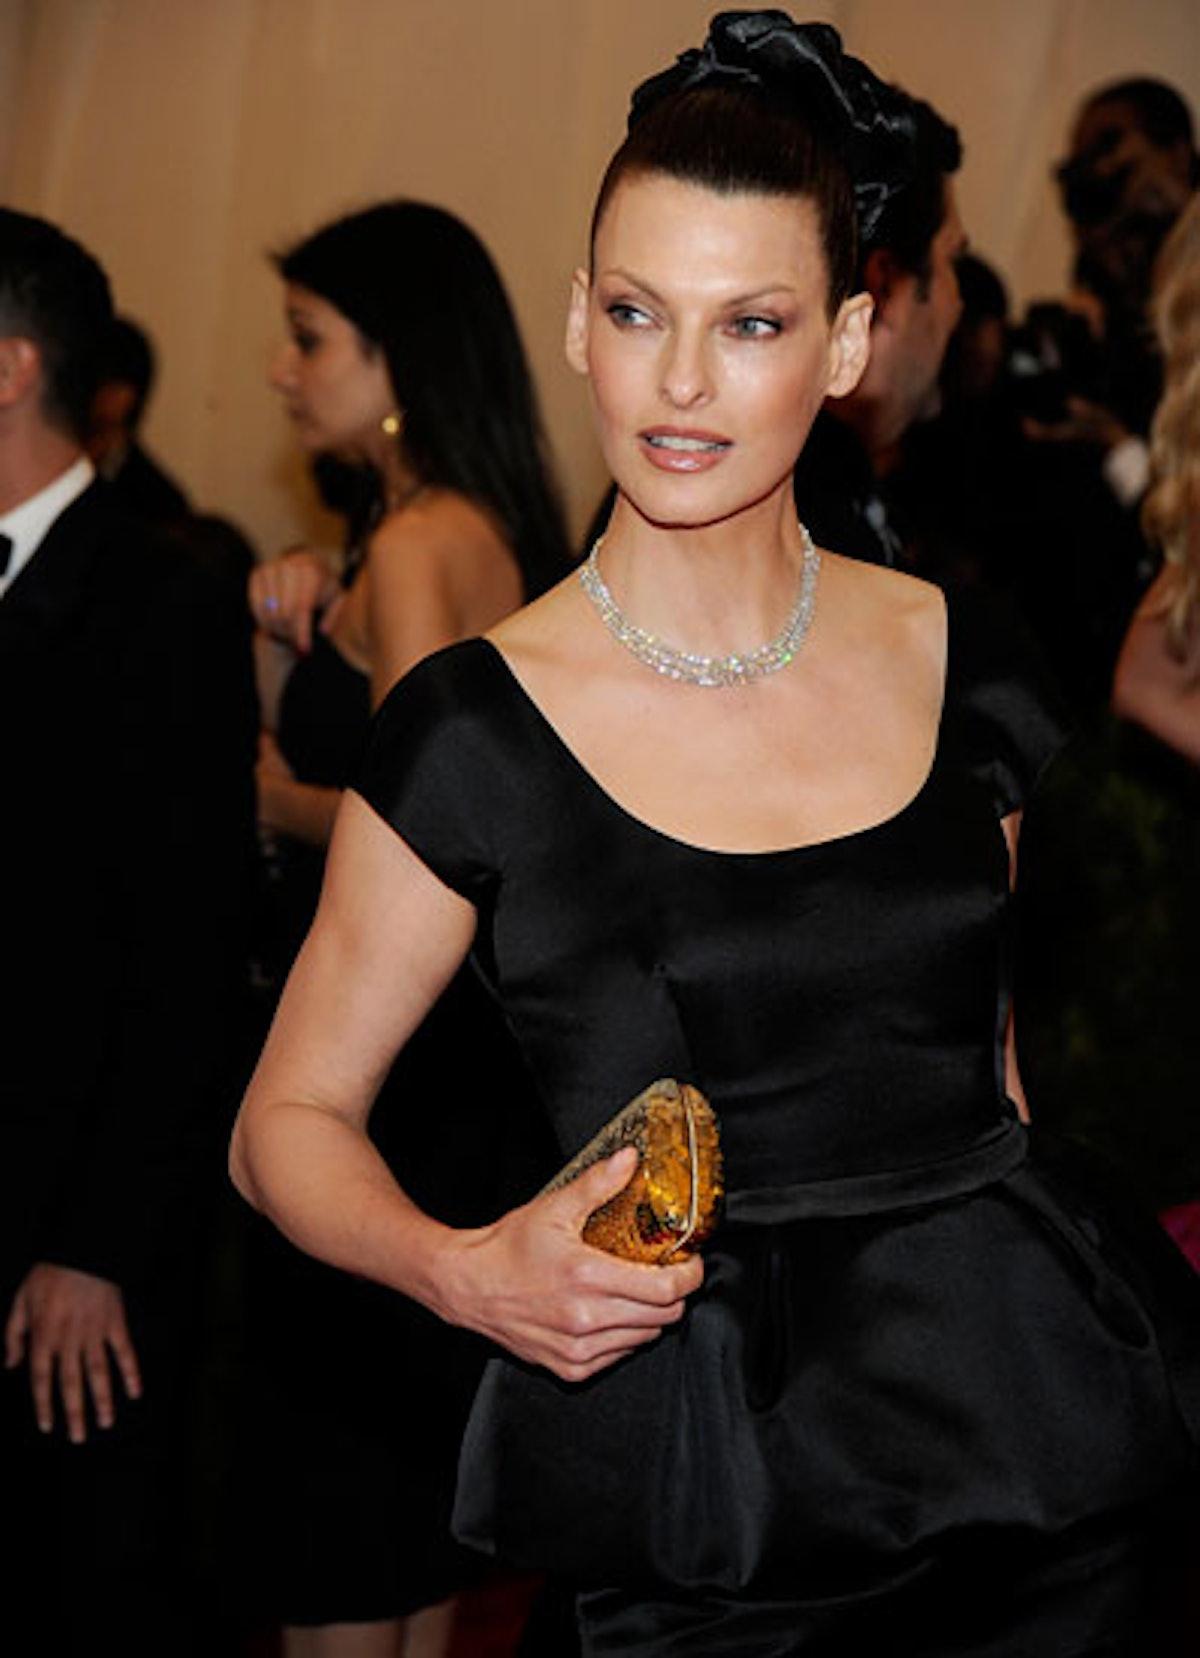 pass-met-costume-institute-gala-2012-67-v.jpg